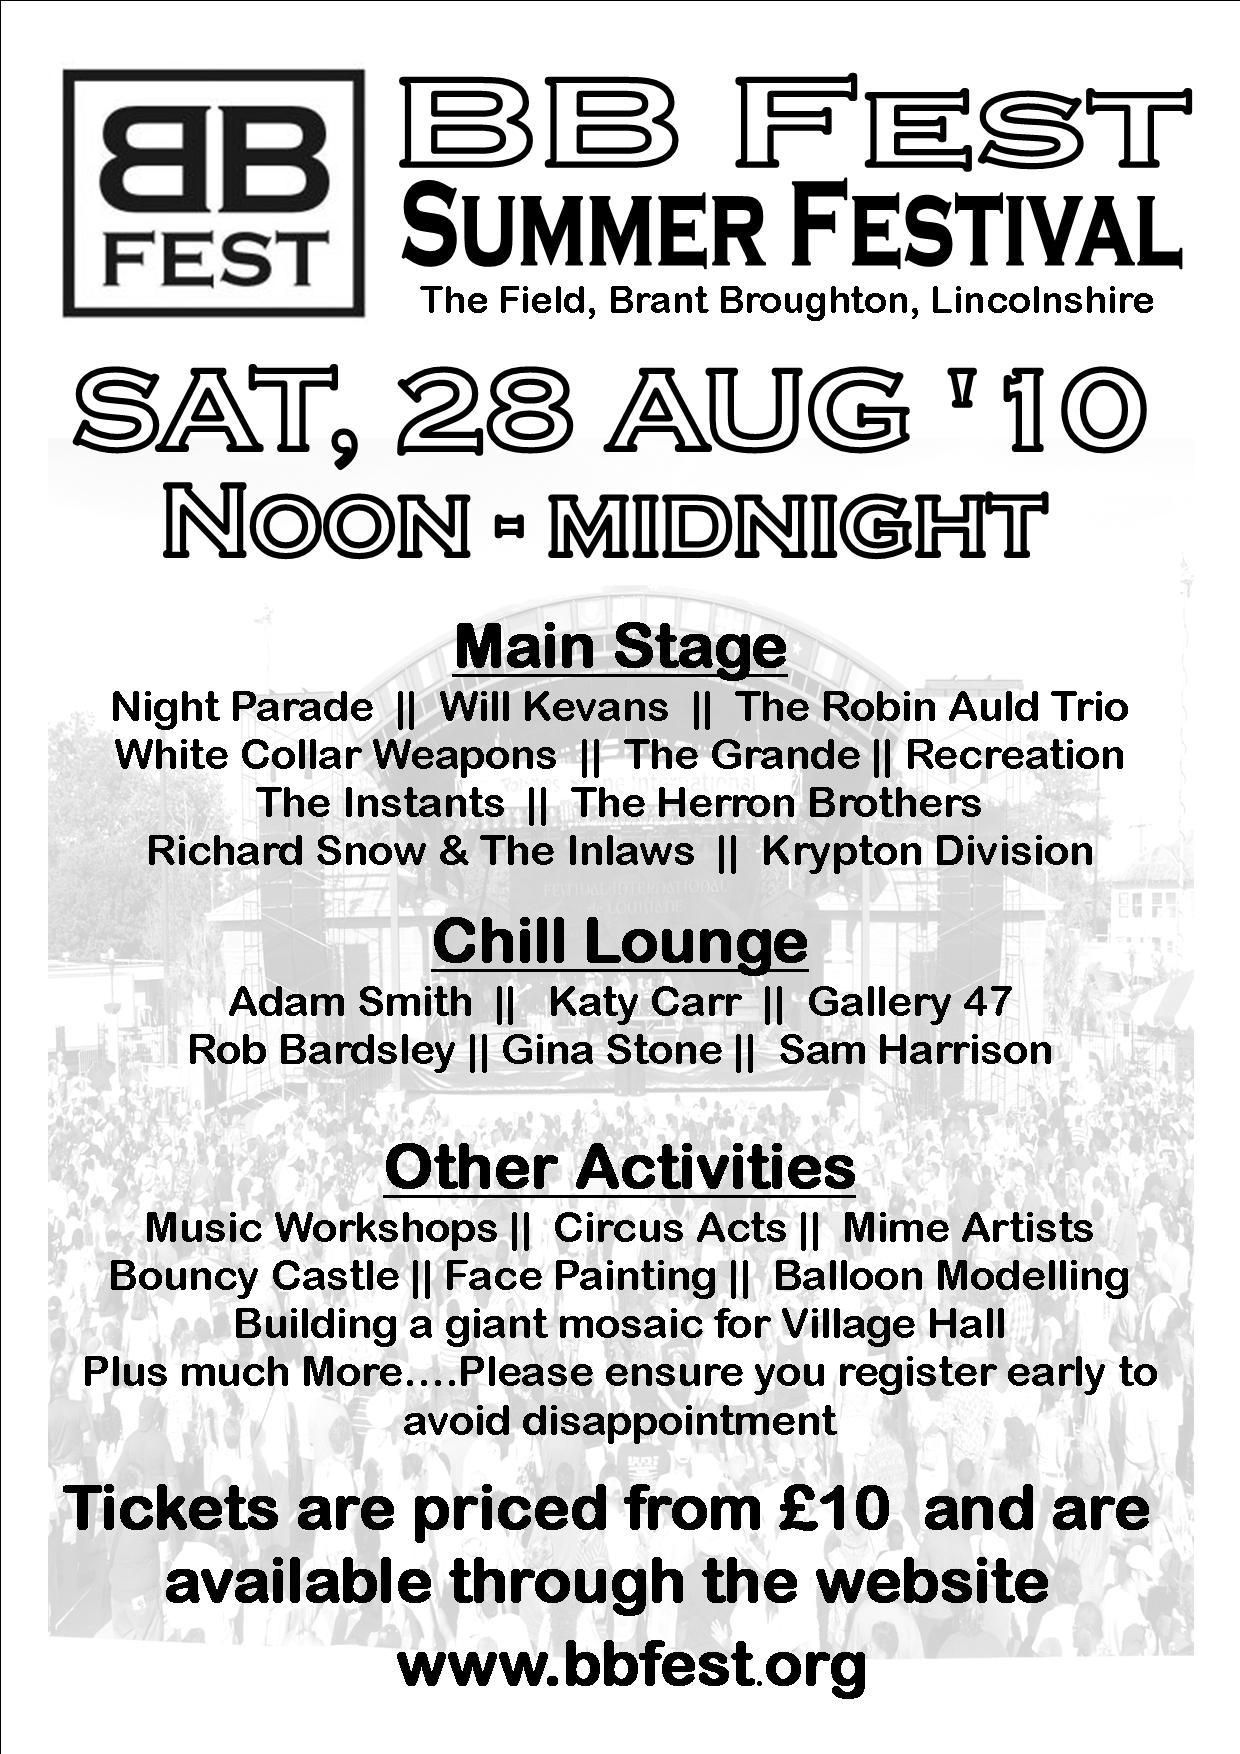 Katy Carr plays BB Fest 9PM 28th Aug 2010